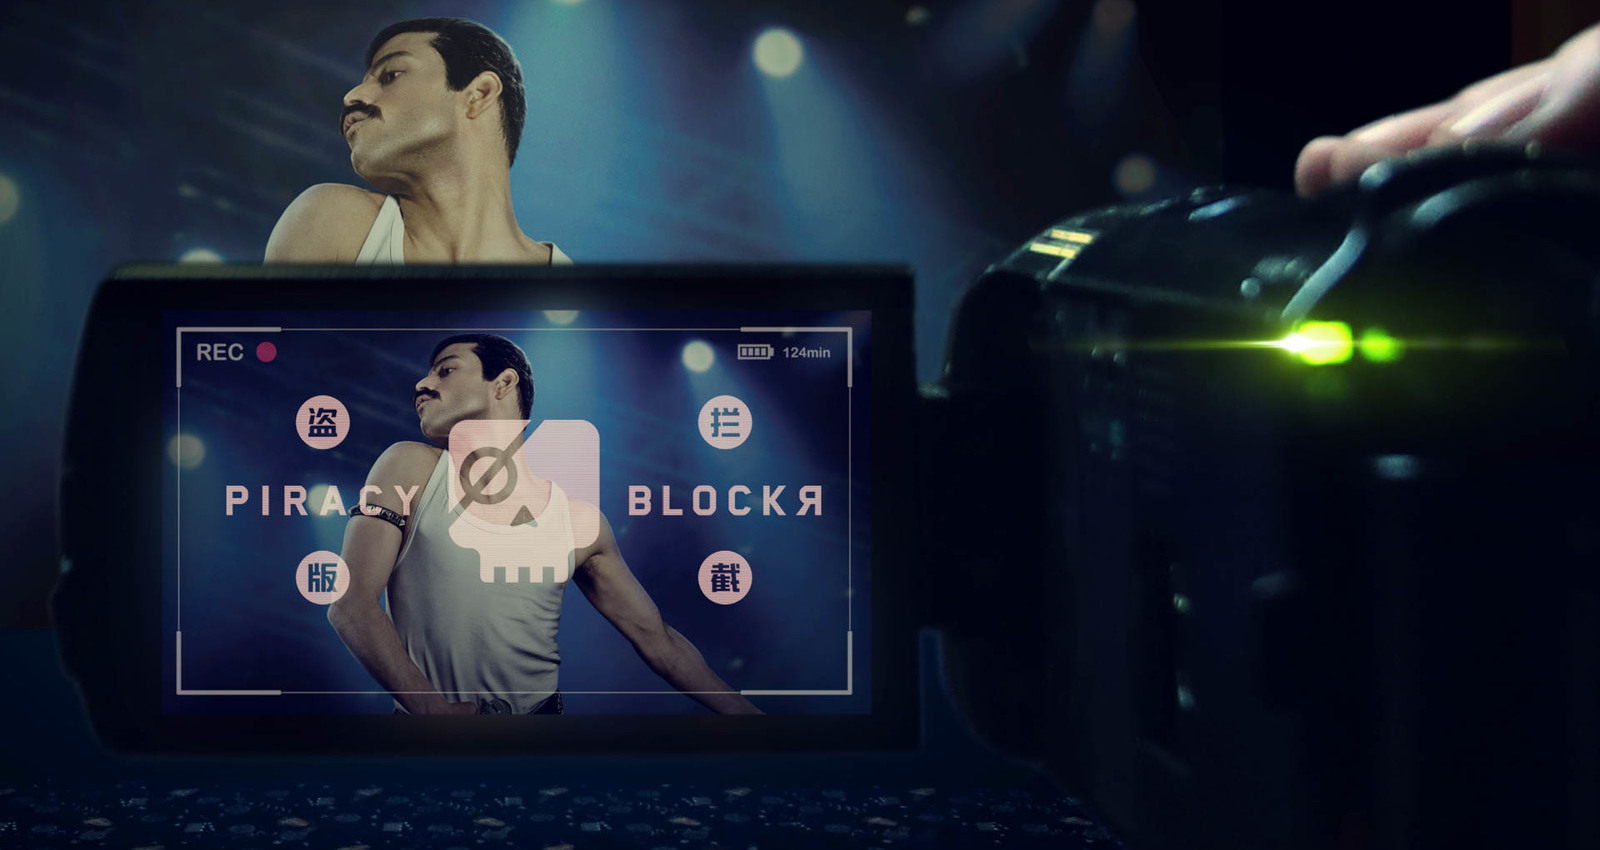 Piracy Blockr